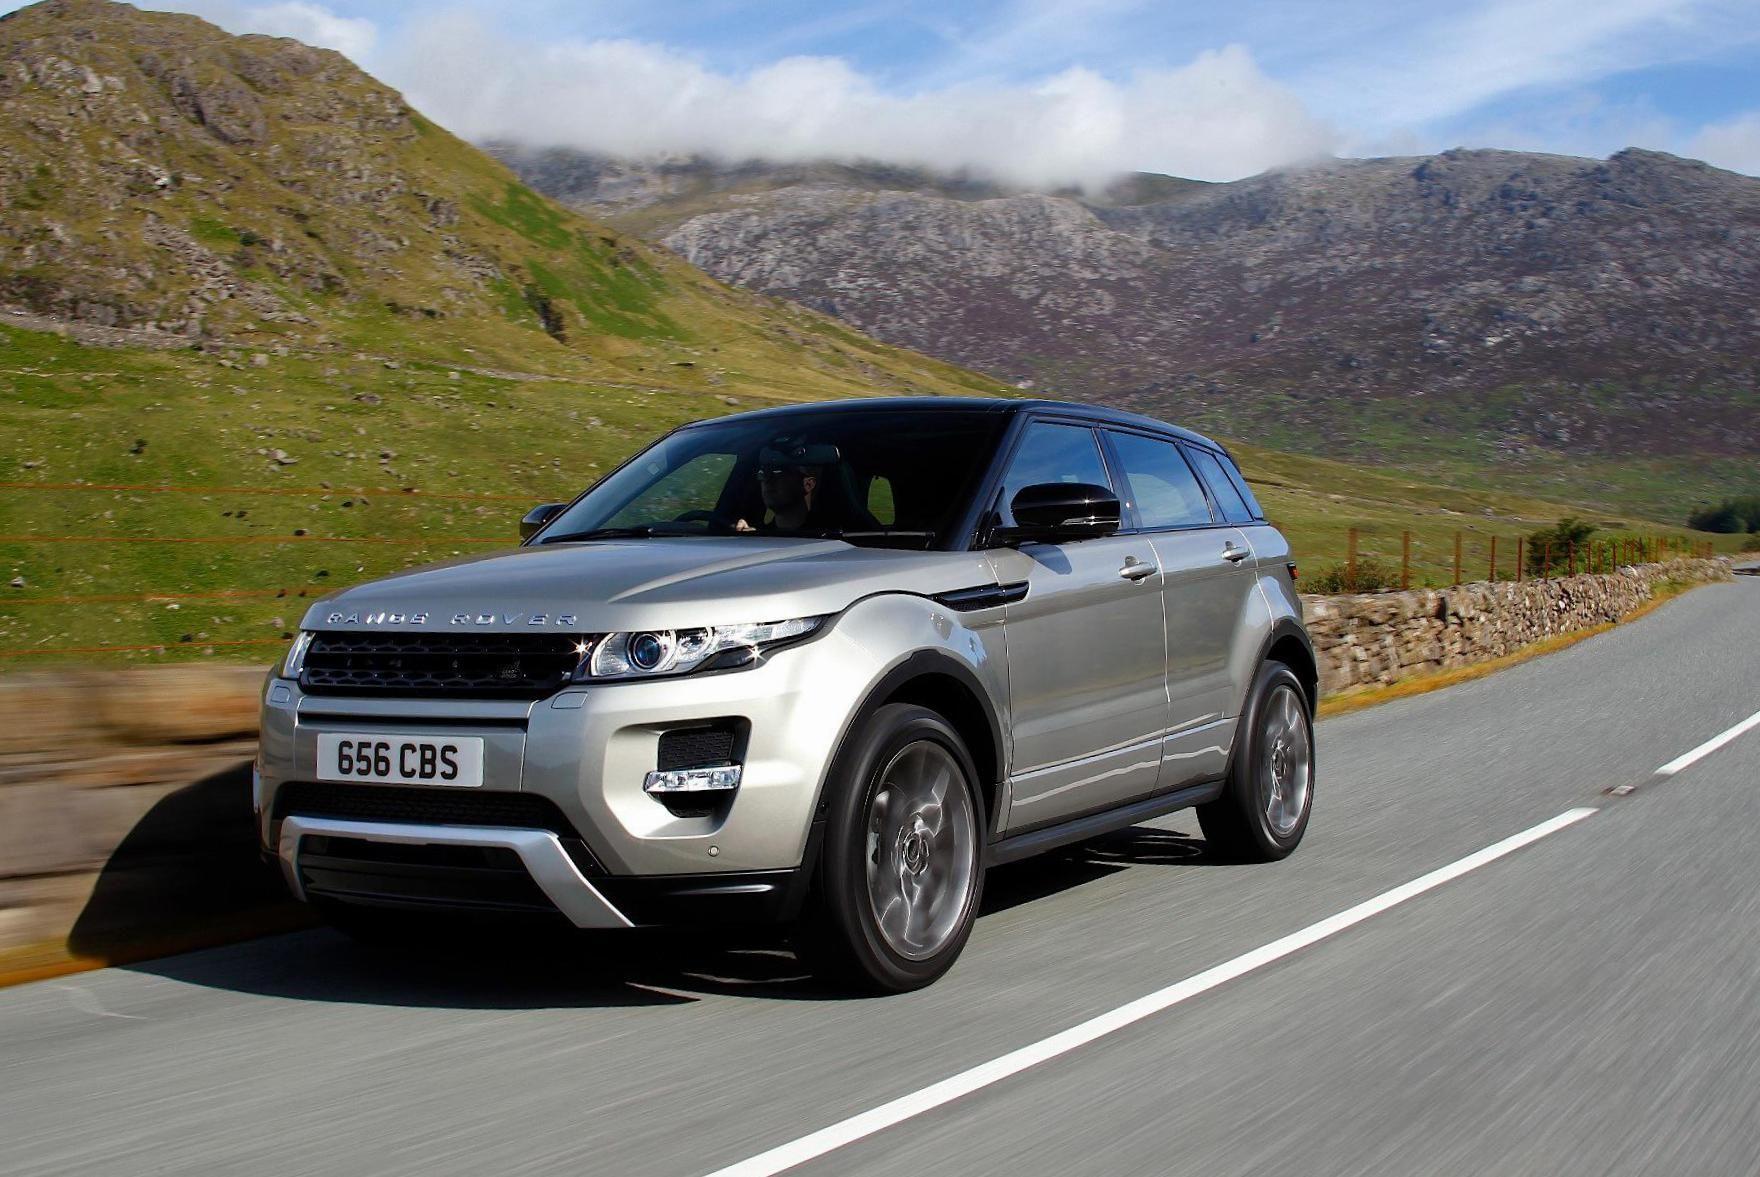 Range Rover Evoque Land Rover spec